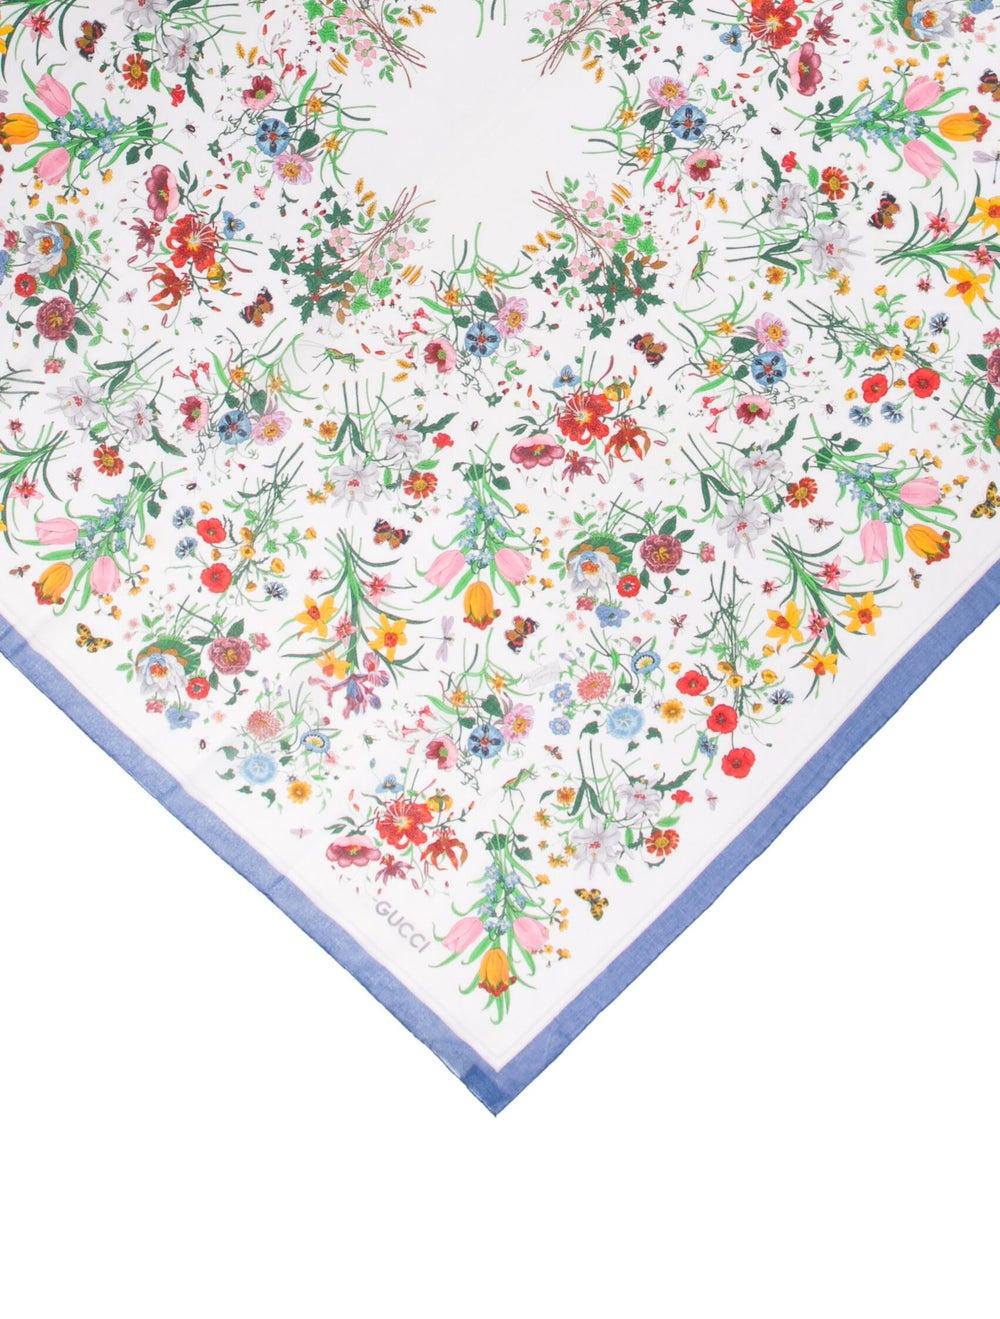 Gucci Vintage Floral Print Scarf White - image 2